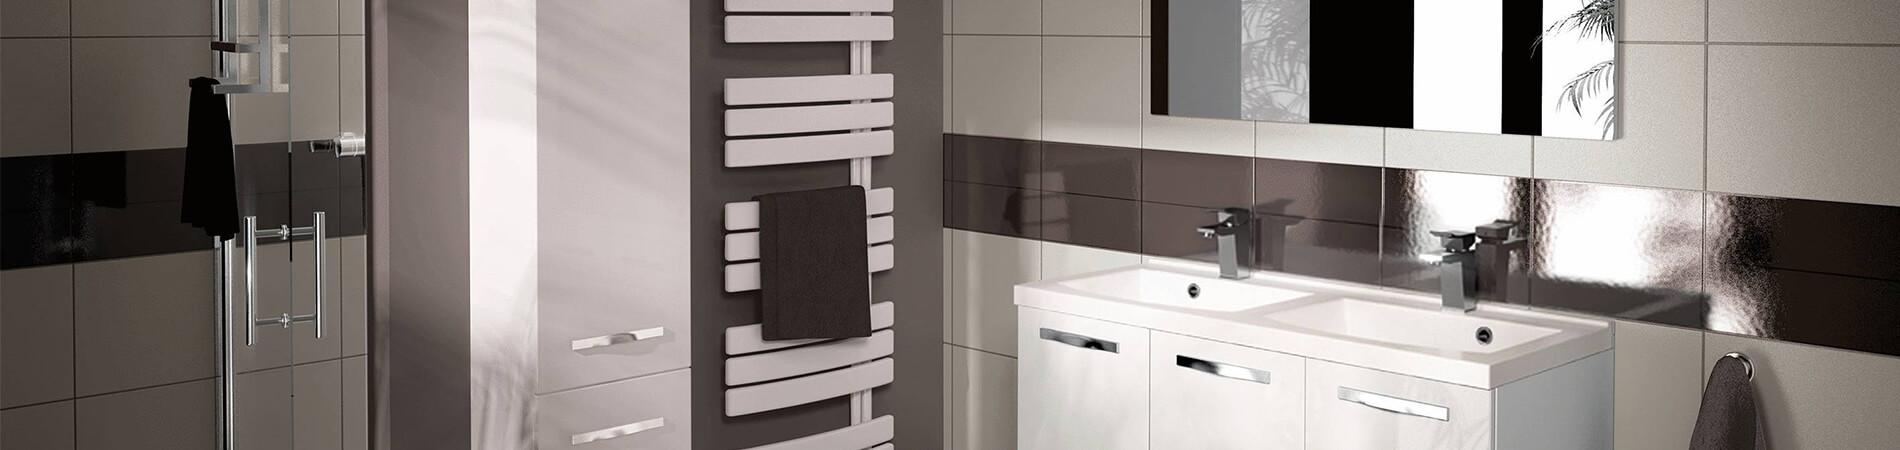 salle de bain r novation cr ation installation vente sanary. Black Bedroom Furniture Sets. Home Design Ideas